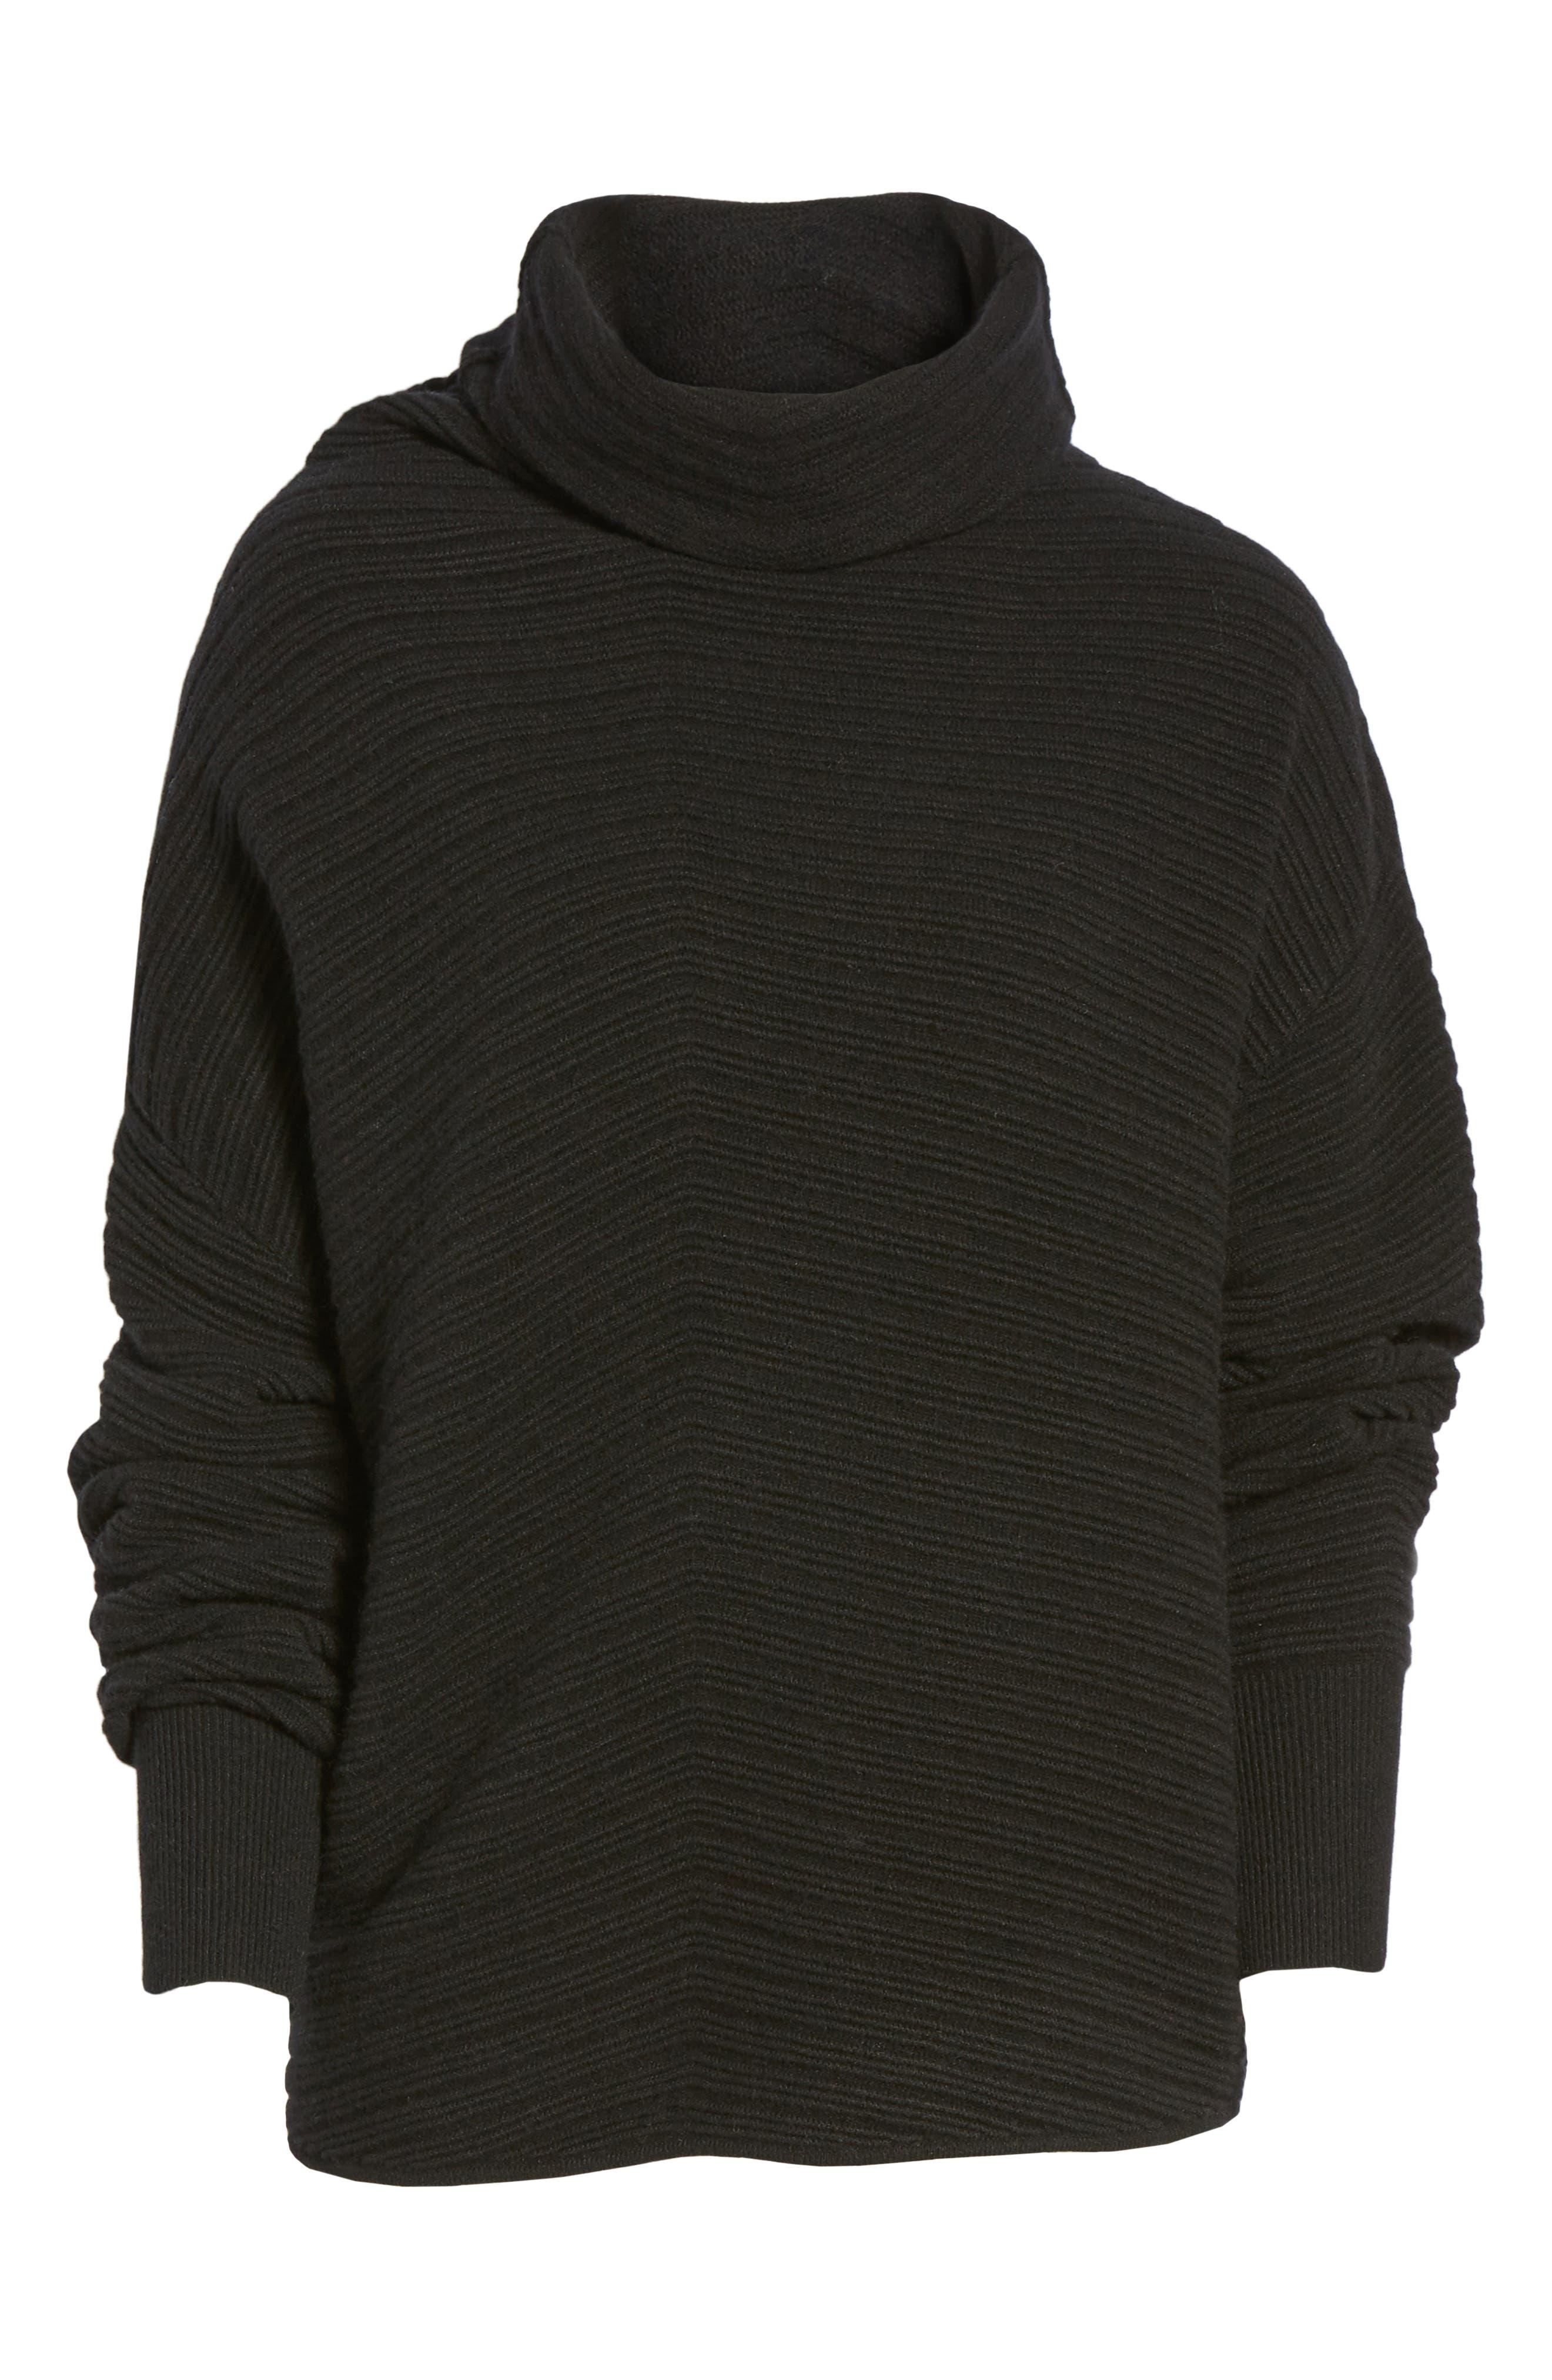 Scrunch Neck Ottoman Knit Cashmere Sweater,                             Alternate thumbnail 6, color,                             Black